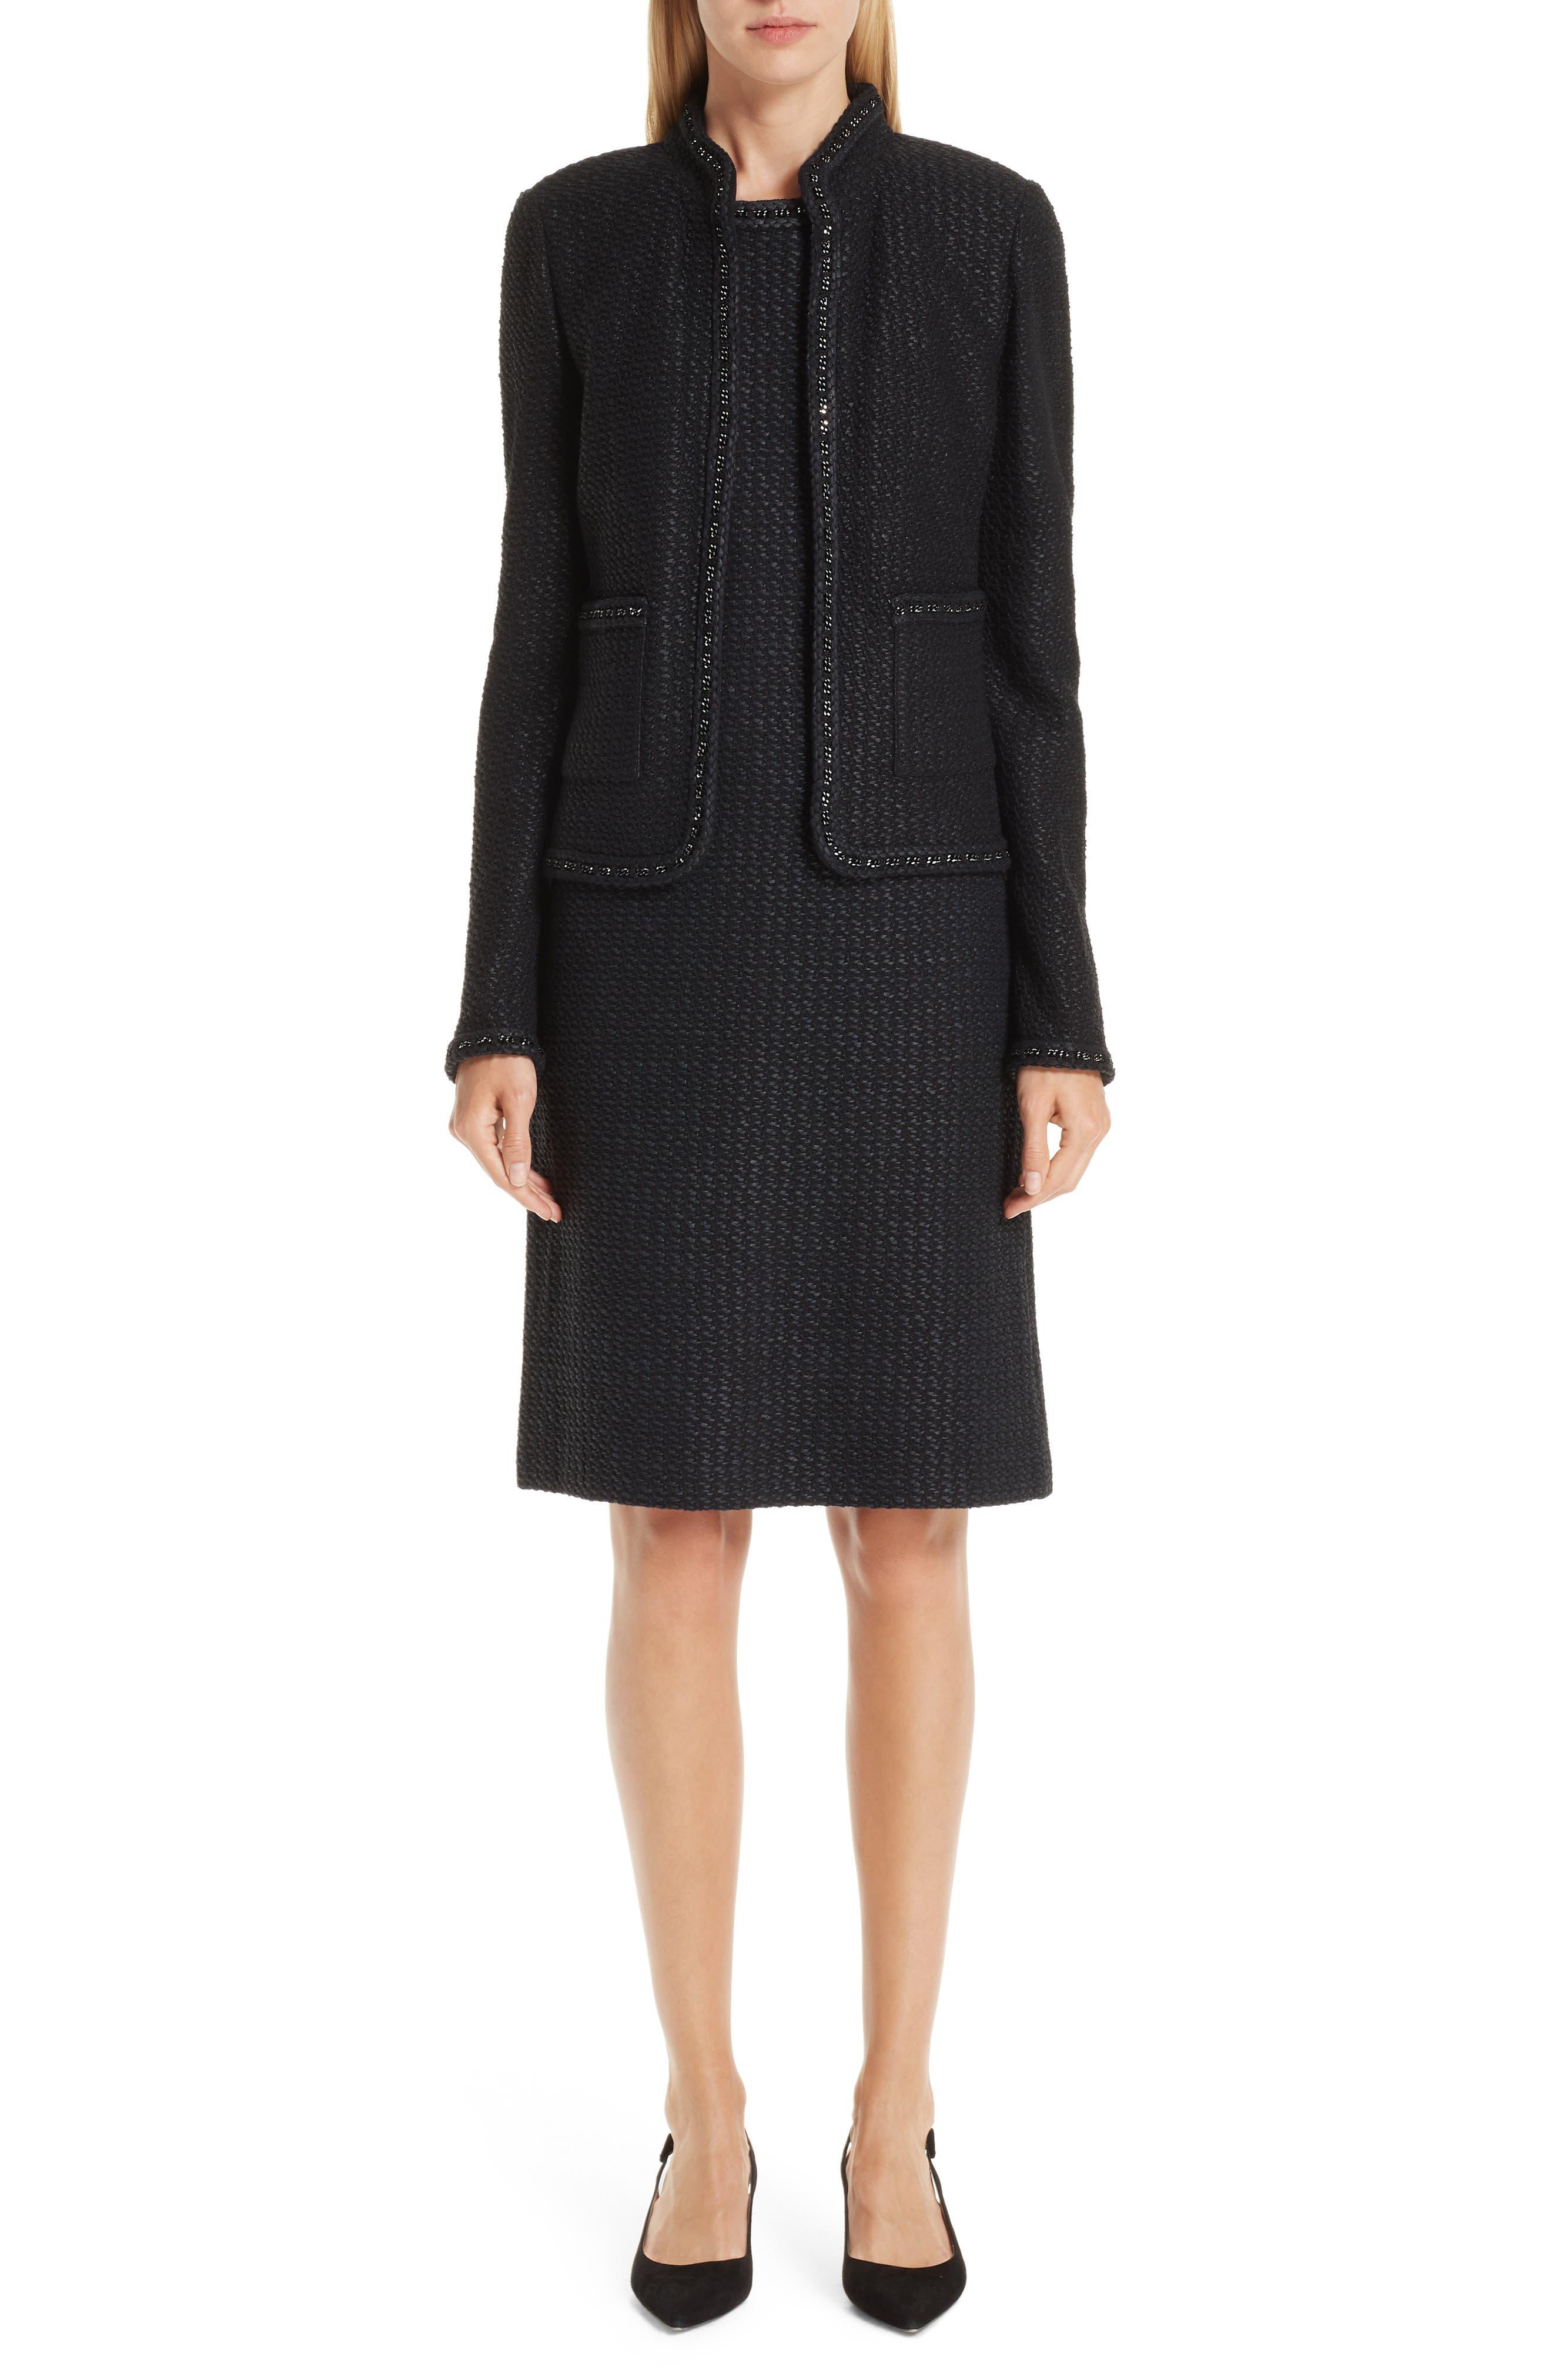 ST. JOHN COLLECTION, Adina Chain Trim Knit Dress, Alternate thumbnail 8, color, CAVIAR